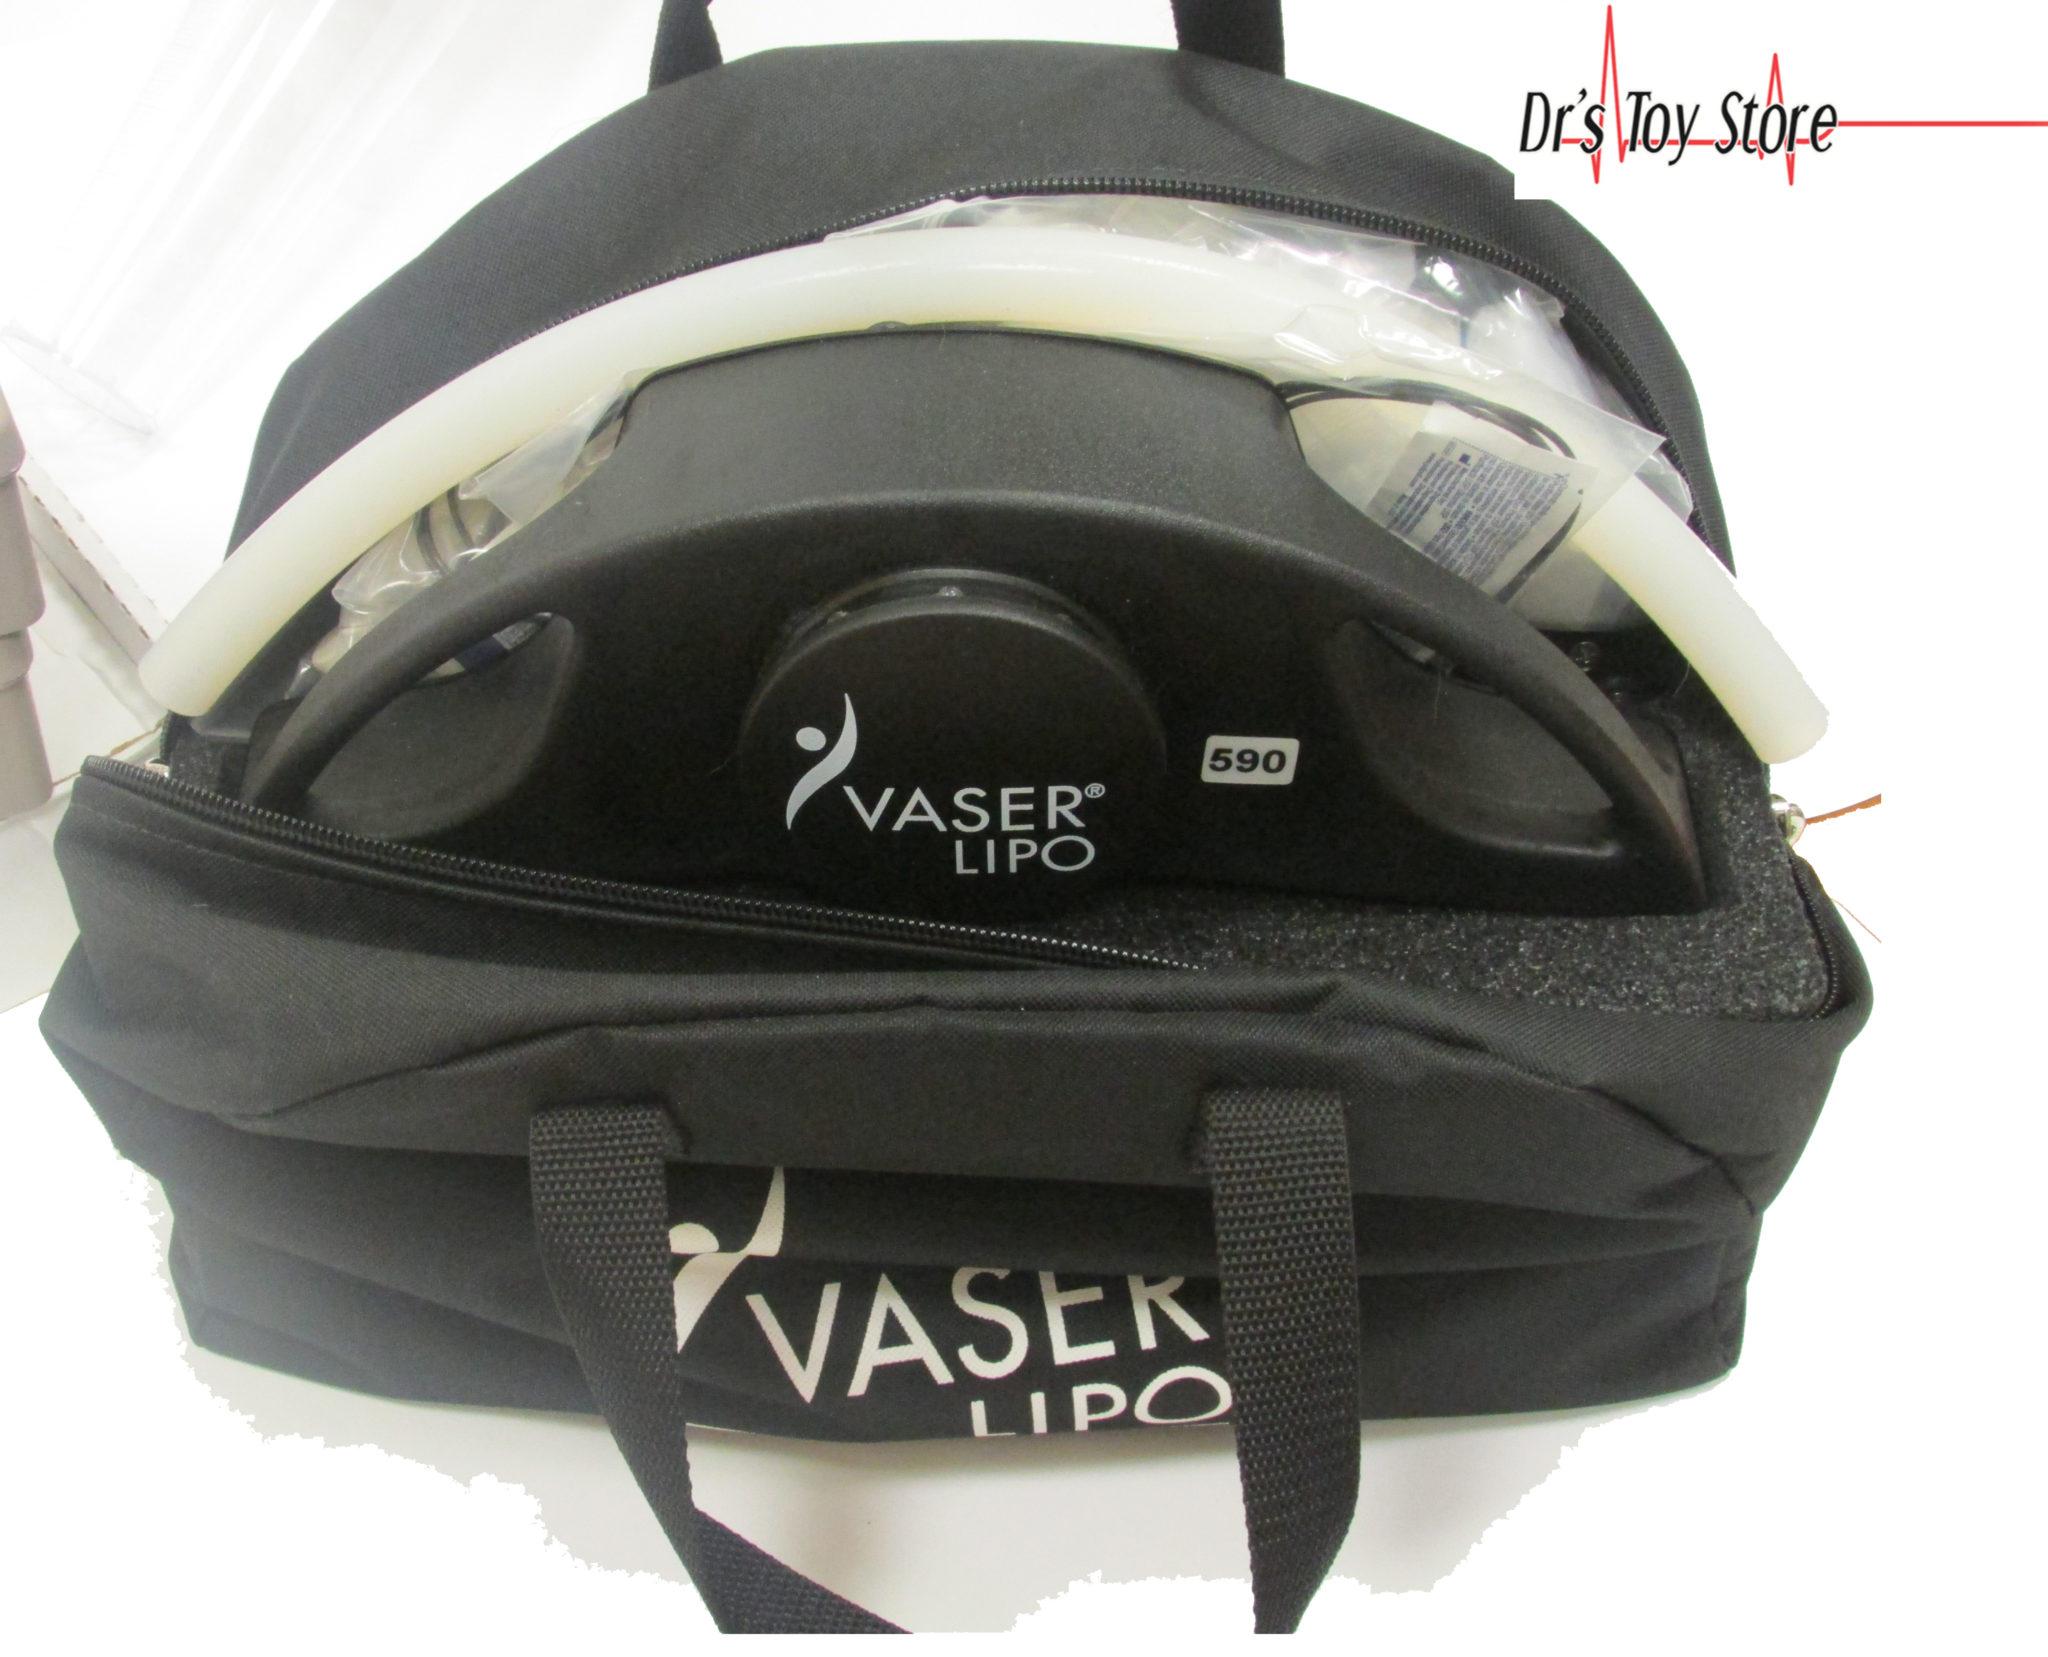 vaser lipo machine for sale